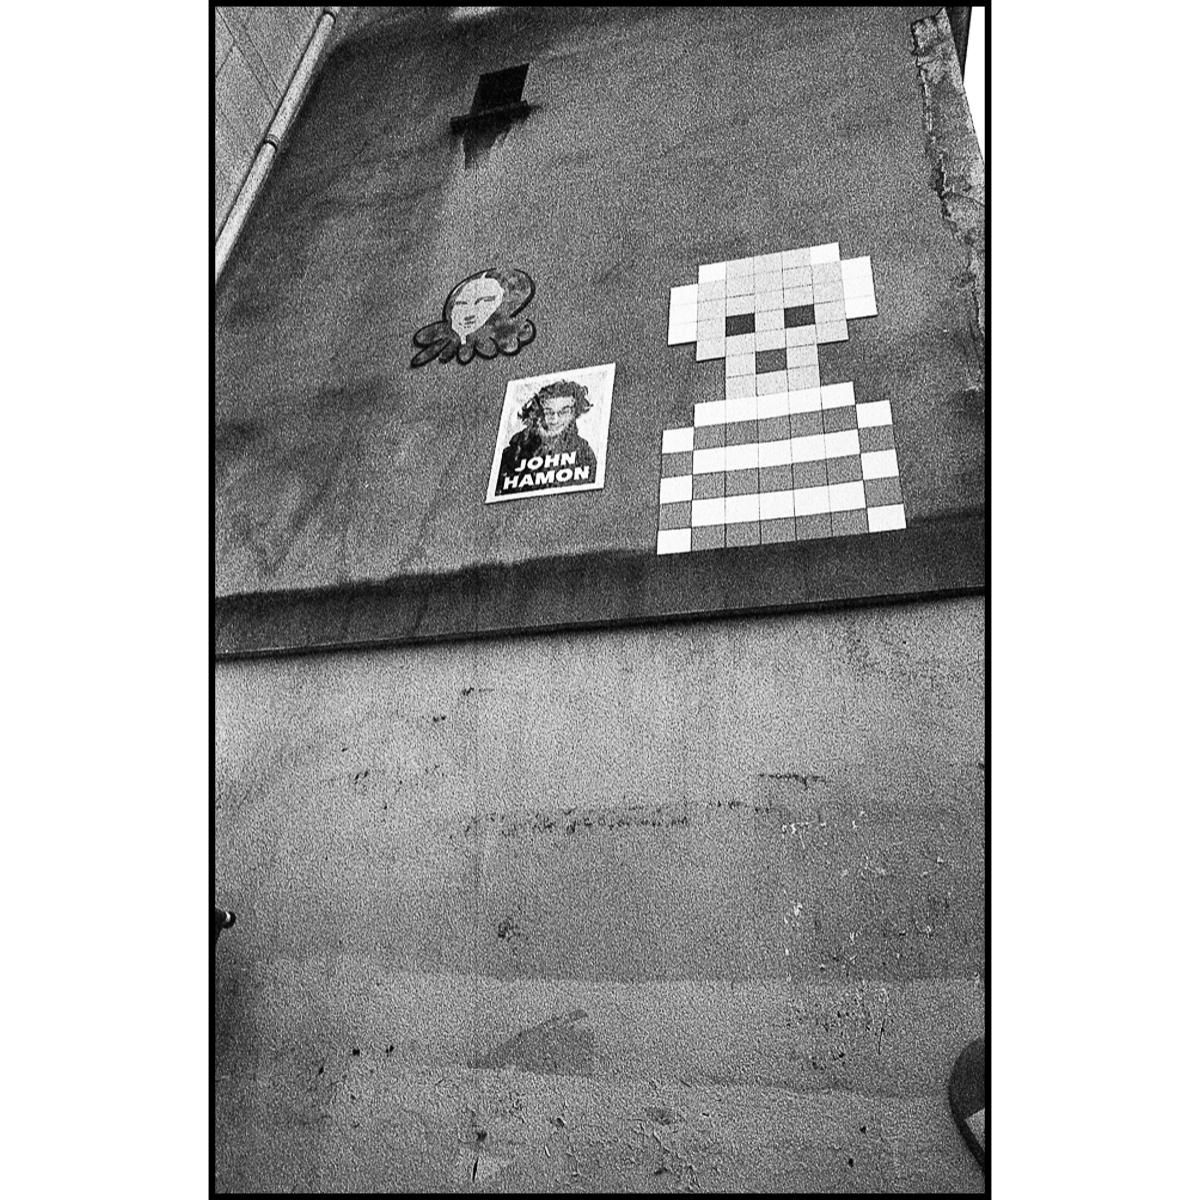 paris file-108.jpg